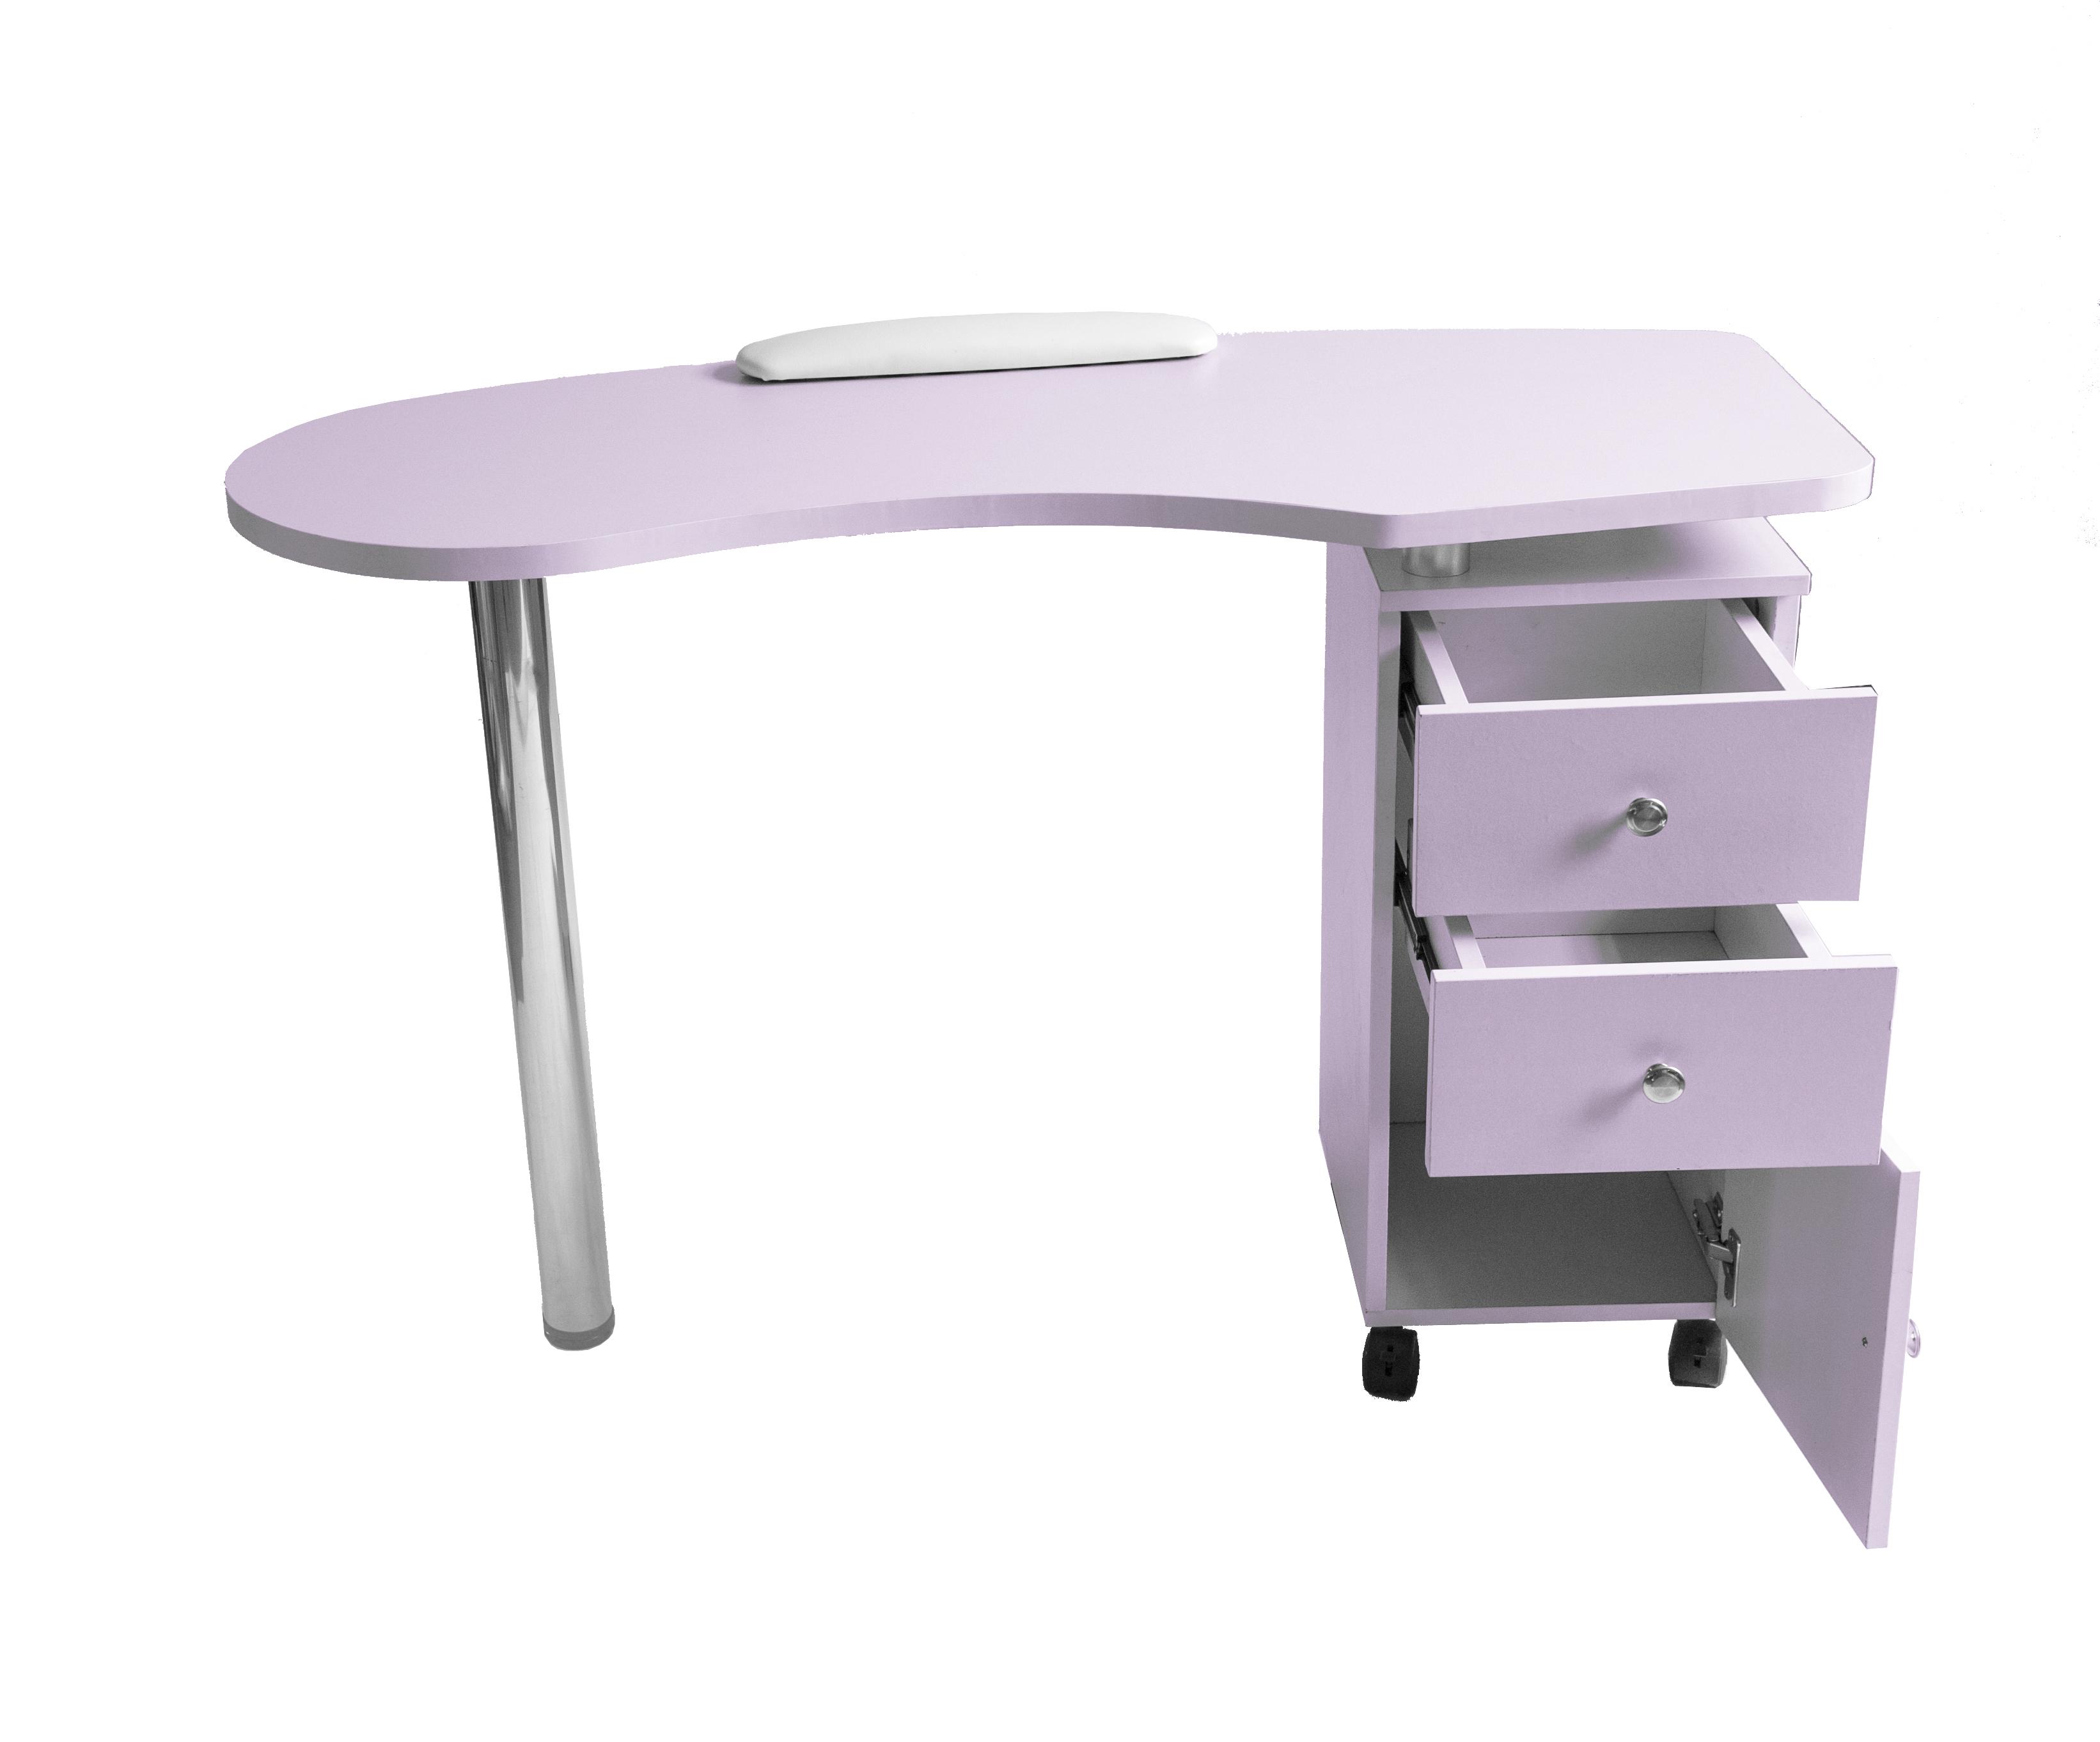 Barberpub purple manicure nail table station spa salon for A m salon equipment